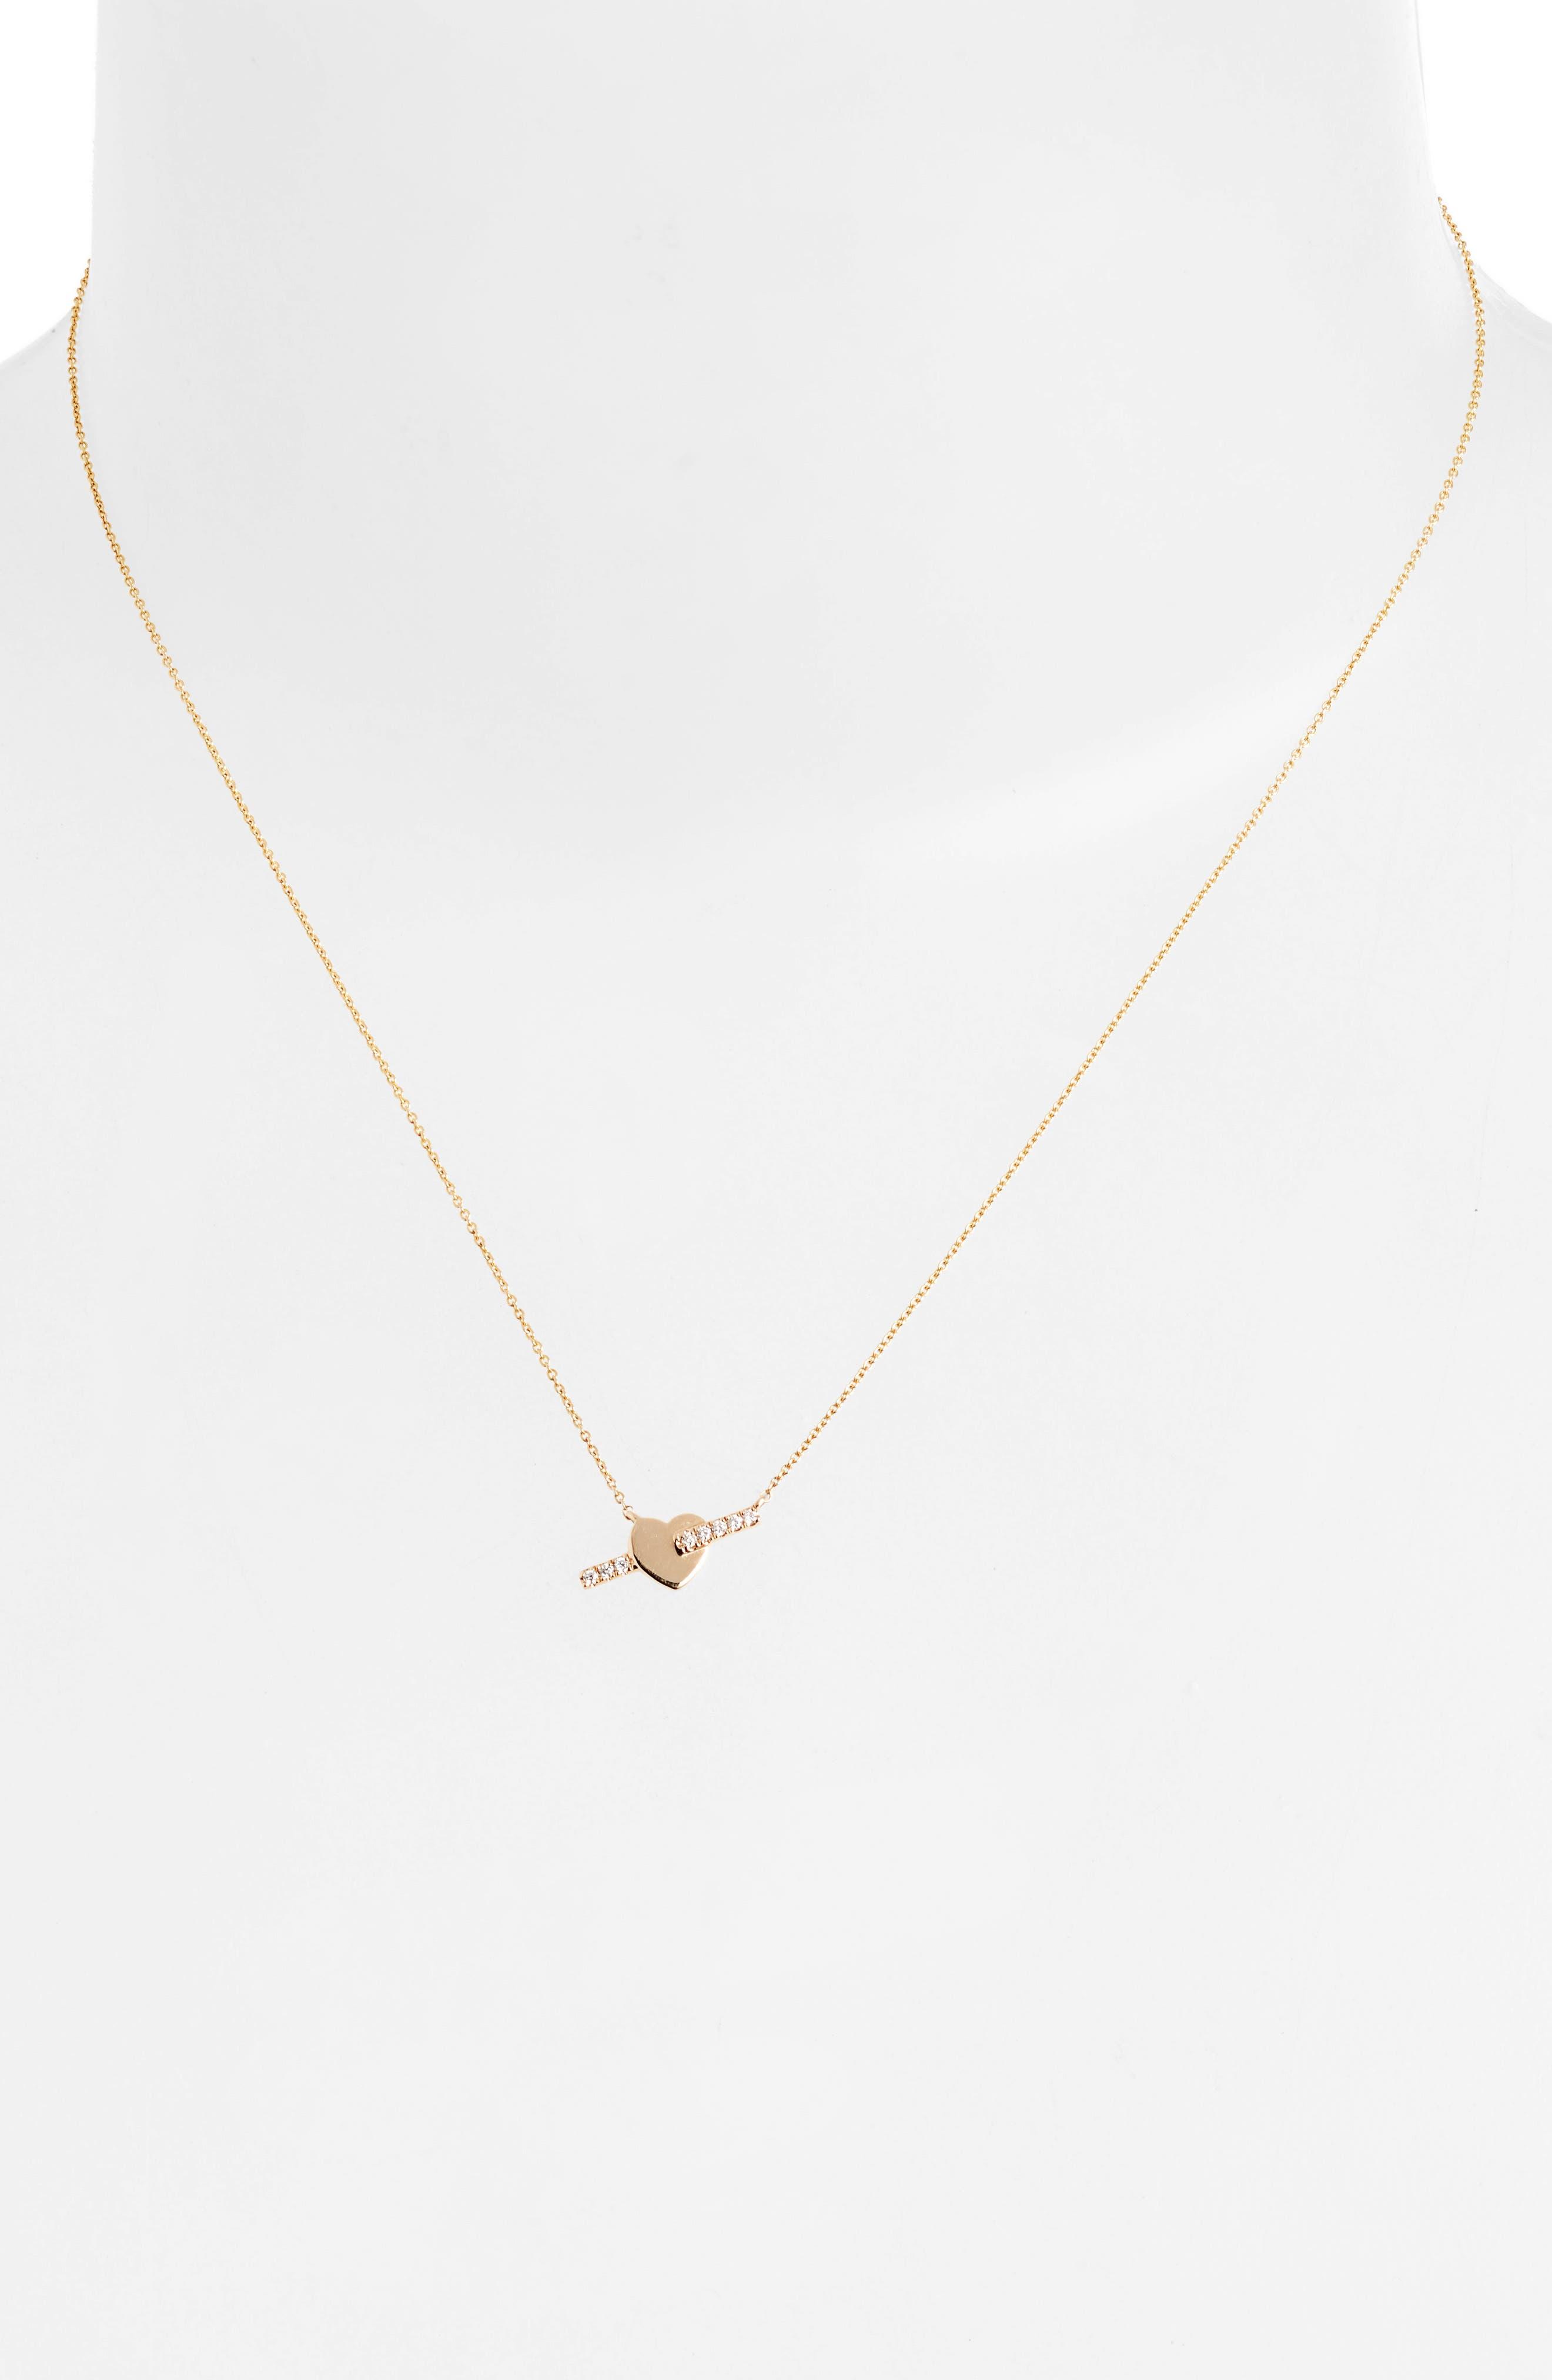 DANA REBECCA DESIGNS, Dana Rebecca Livi Gold Heart Bar Diamond Necklace, Alternate thumbnail 2, color, YELLOW GOLD/ DIAMOND